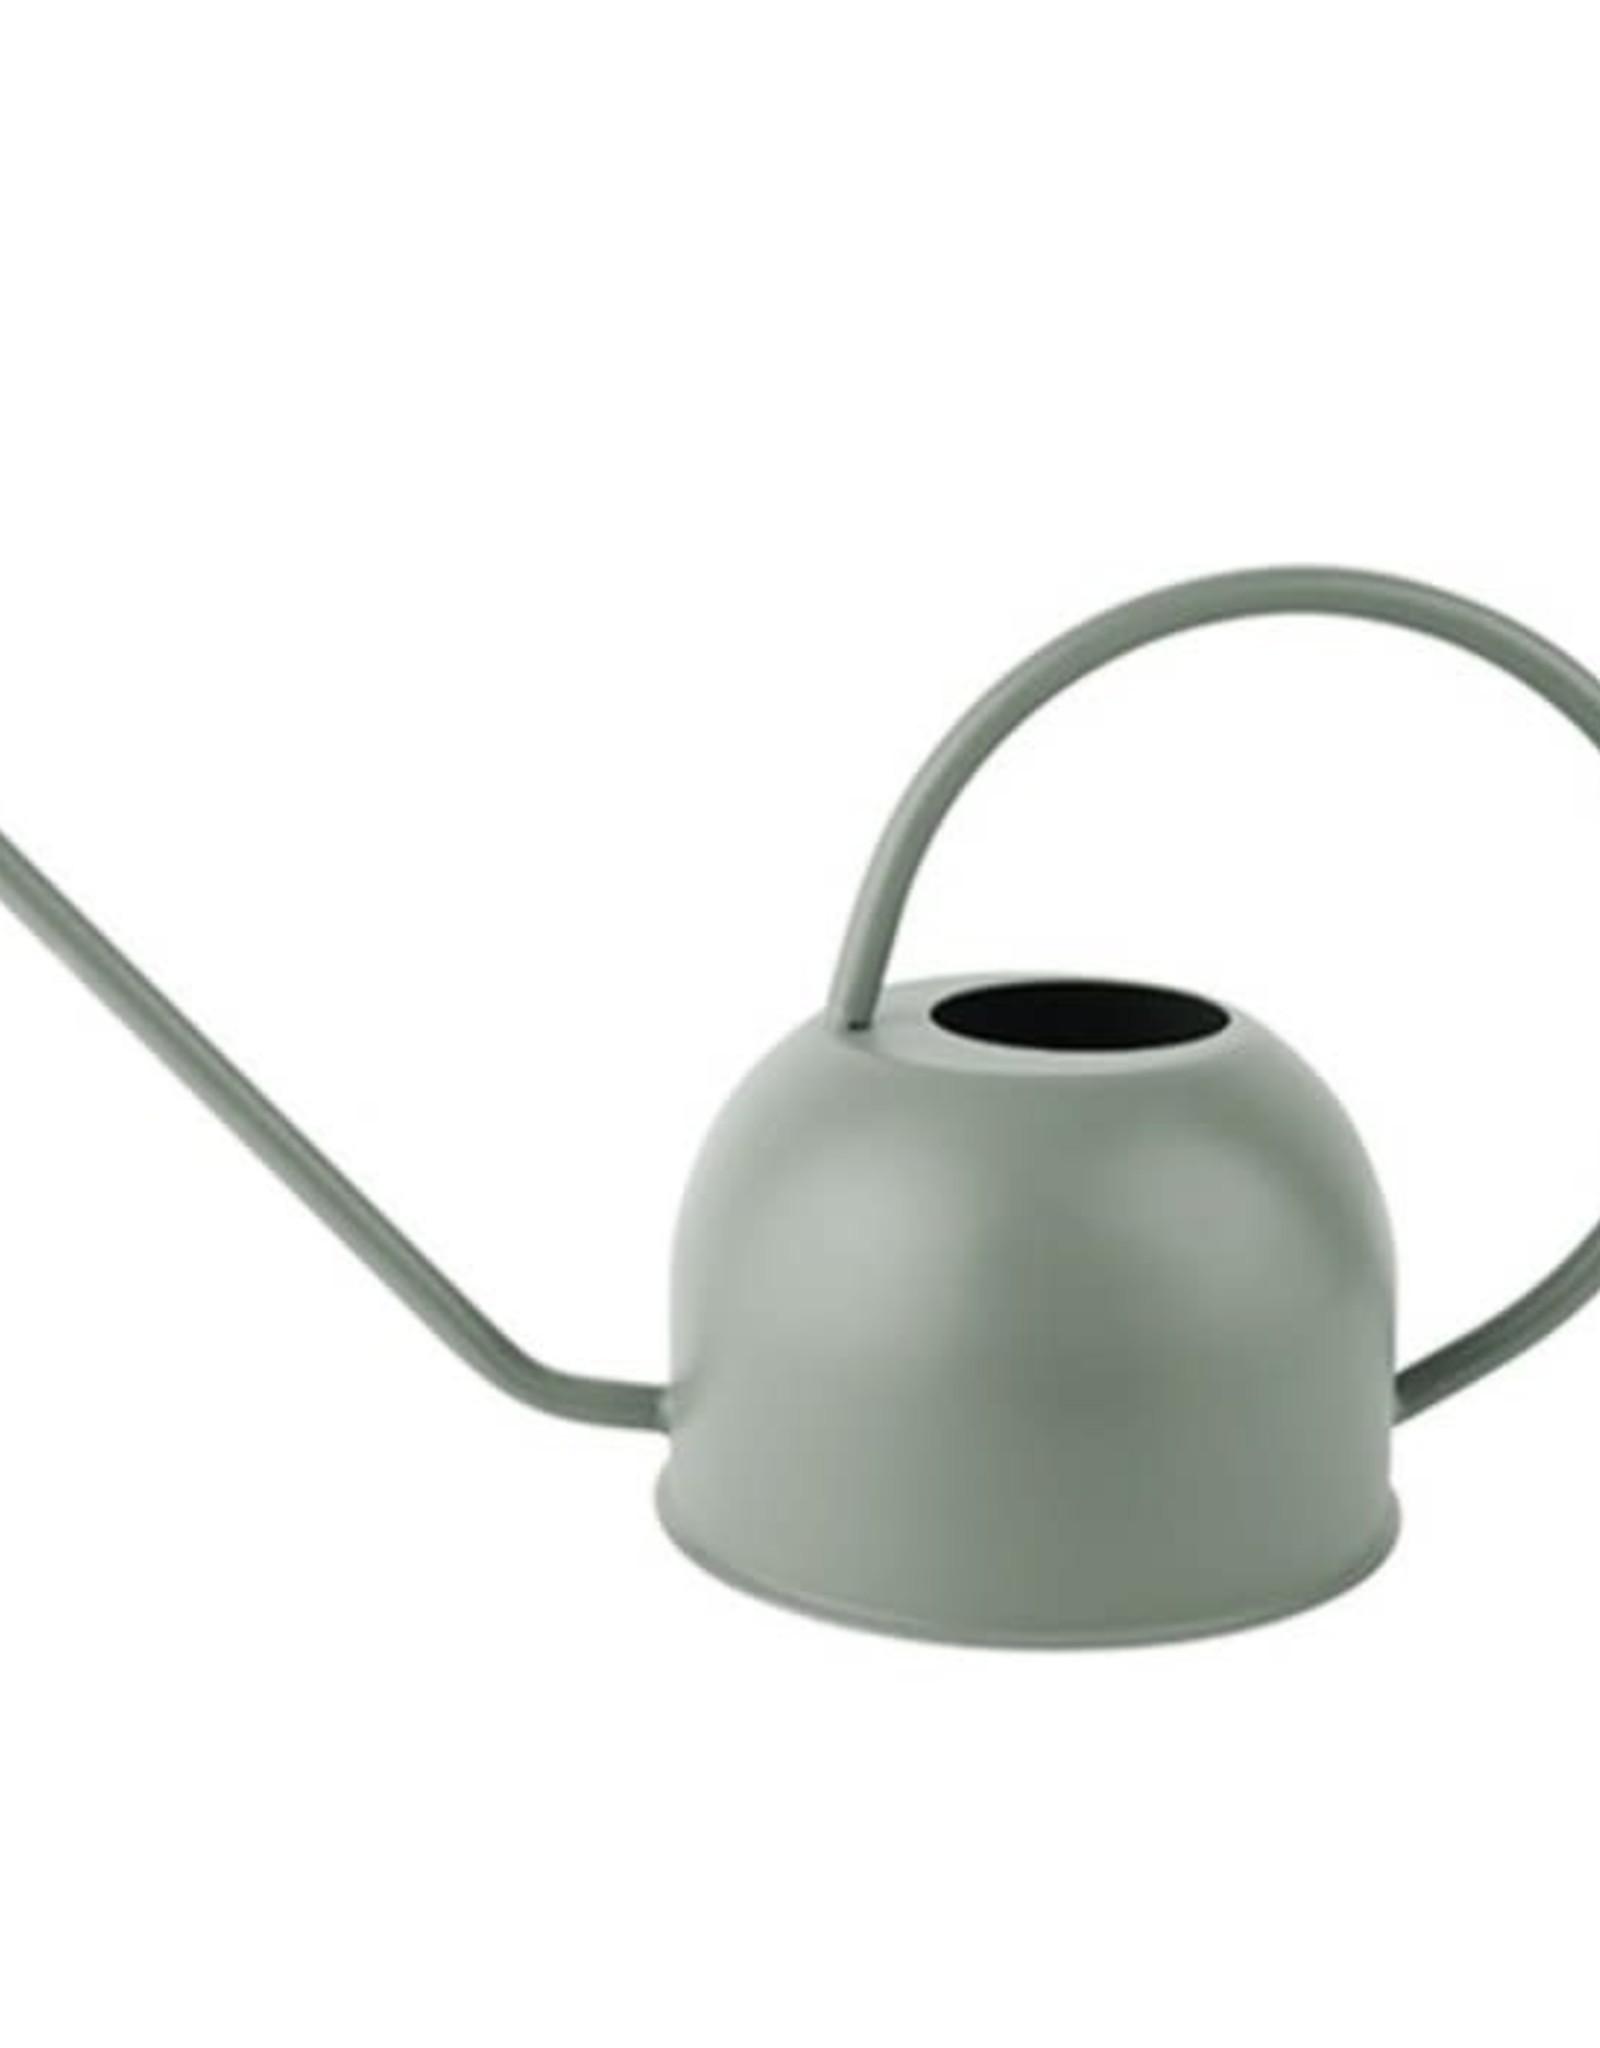 GRUUN Watering Can Bell - Jungle Green